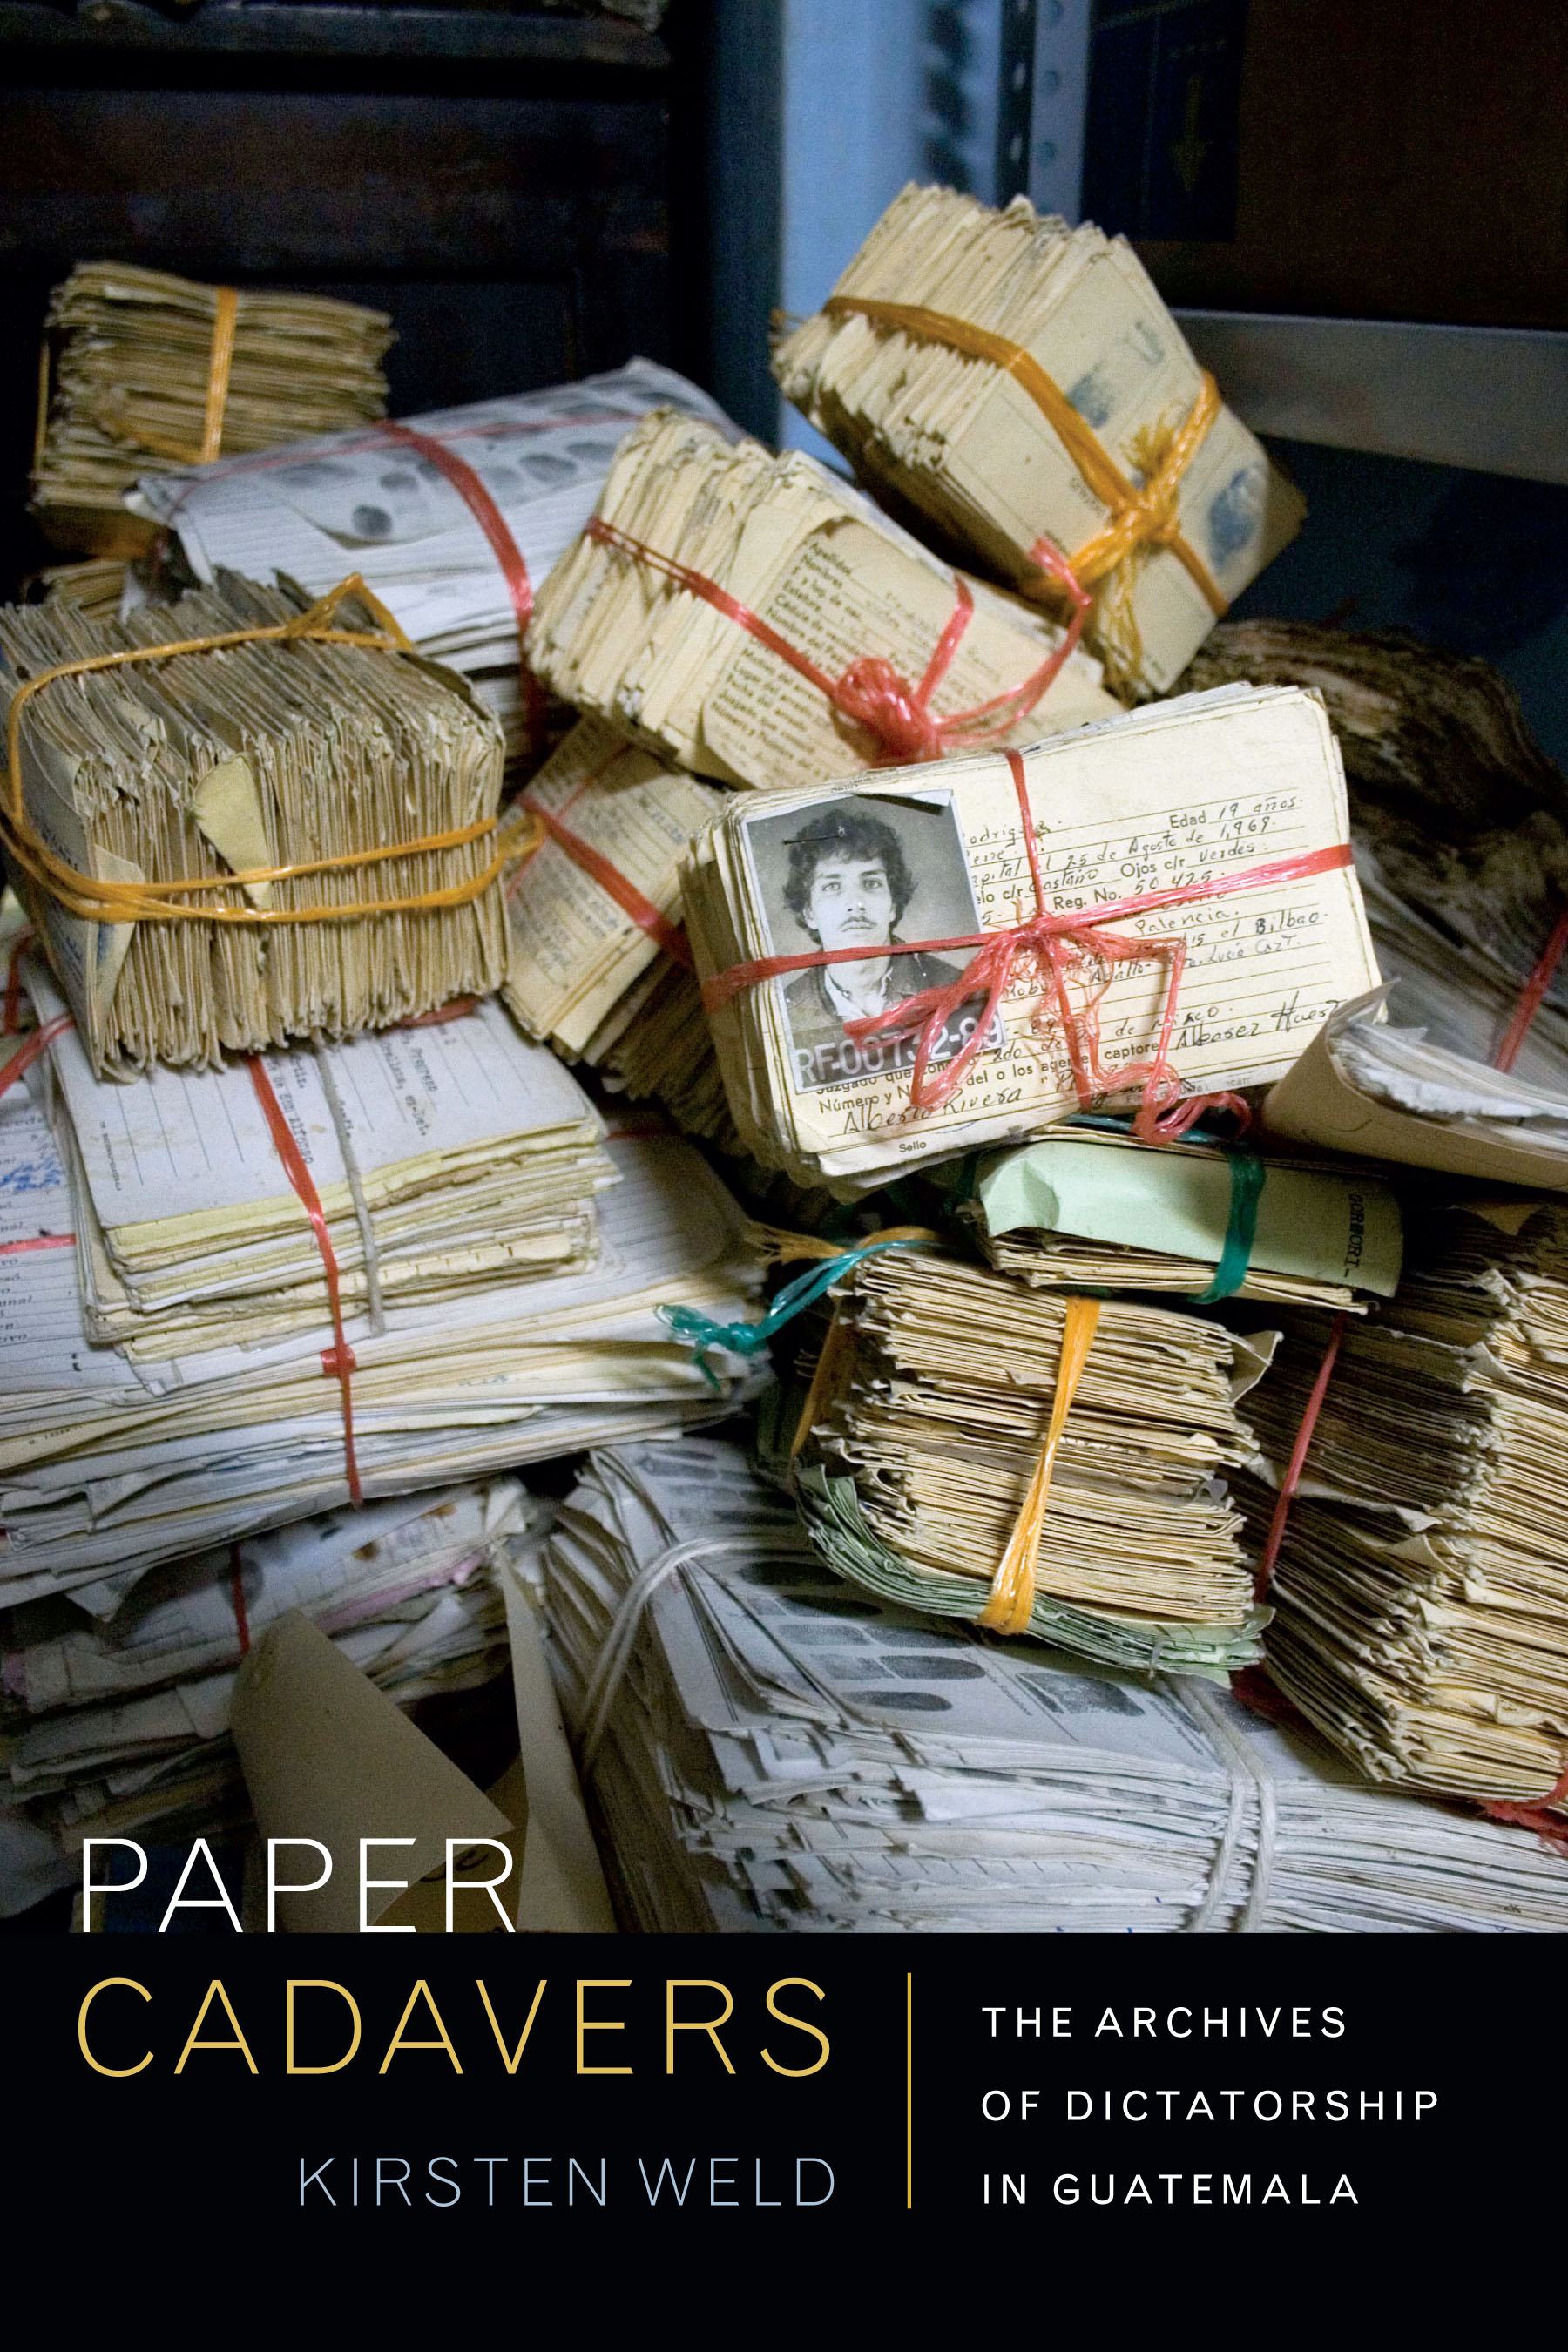 Papercadavers